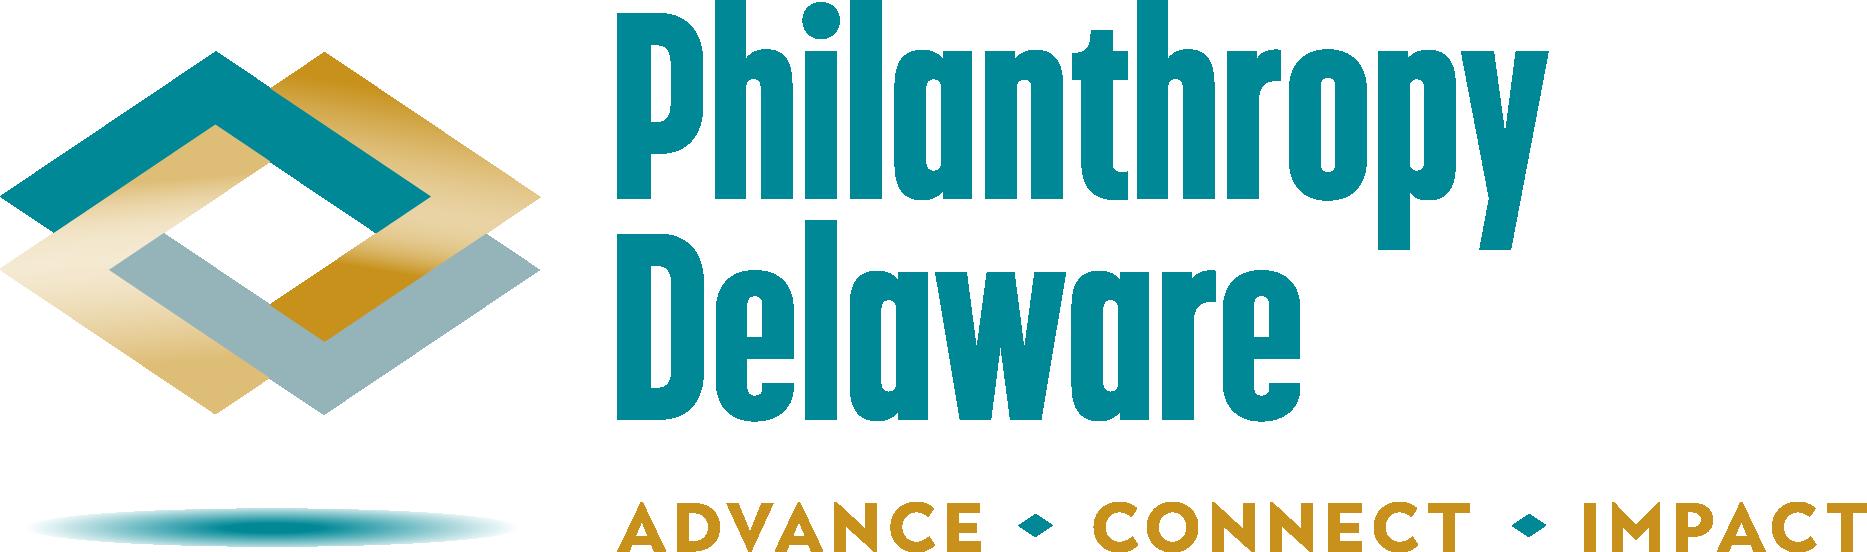 Philanthropy Delaware - Grants